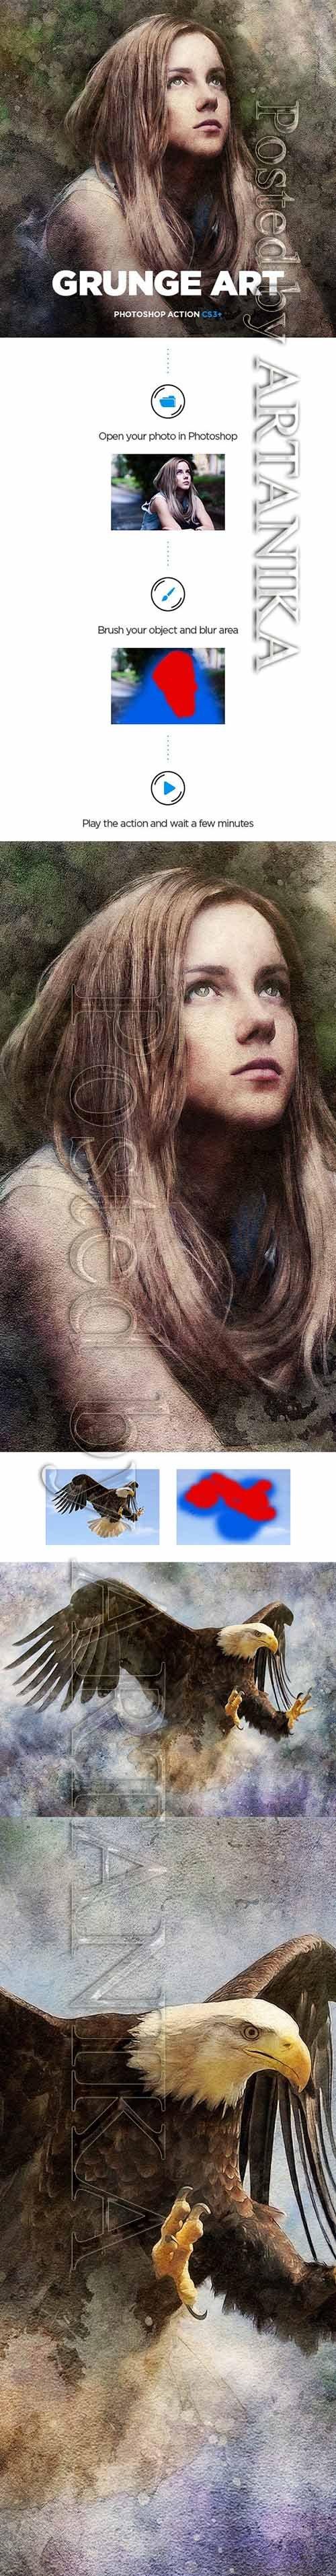 Grunge Art CS3+ Photoshop Action 19529824